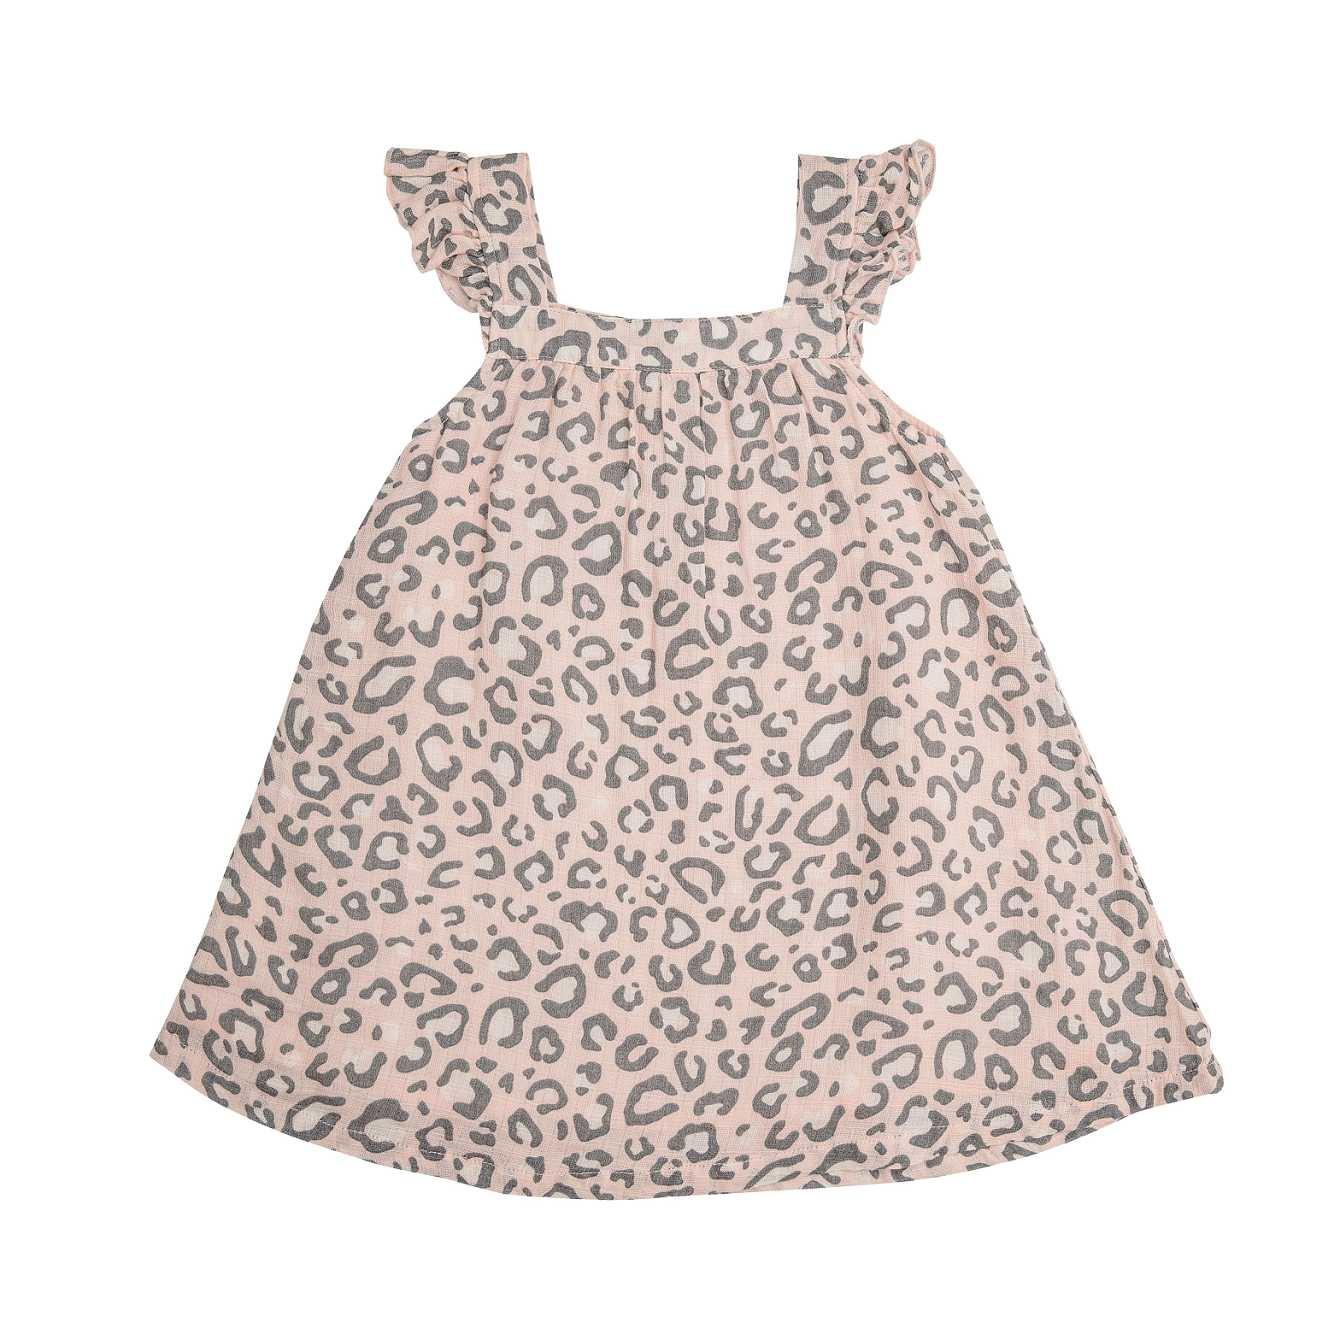 Angel Dear Leopard  Sundress/Diaper Cover Pink 4T